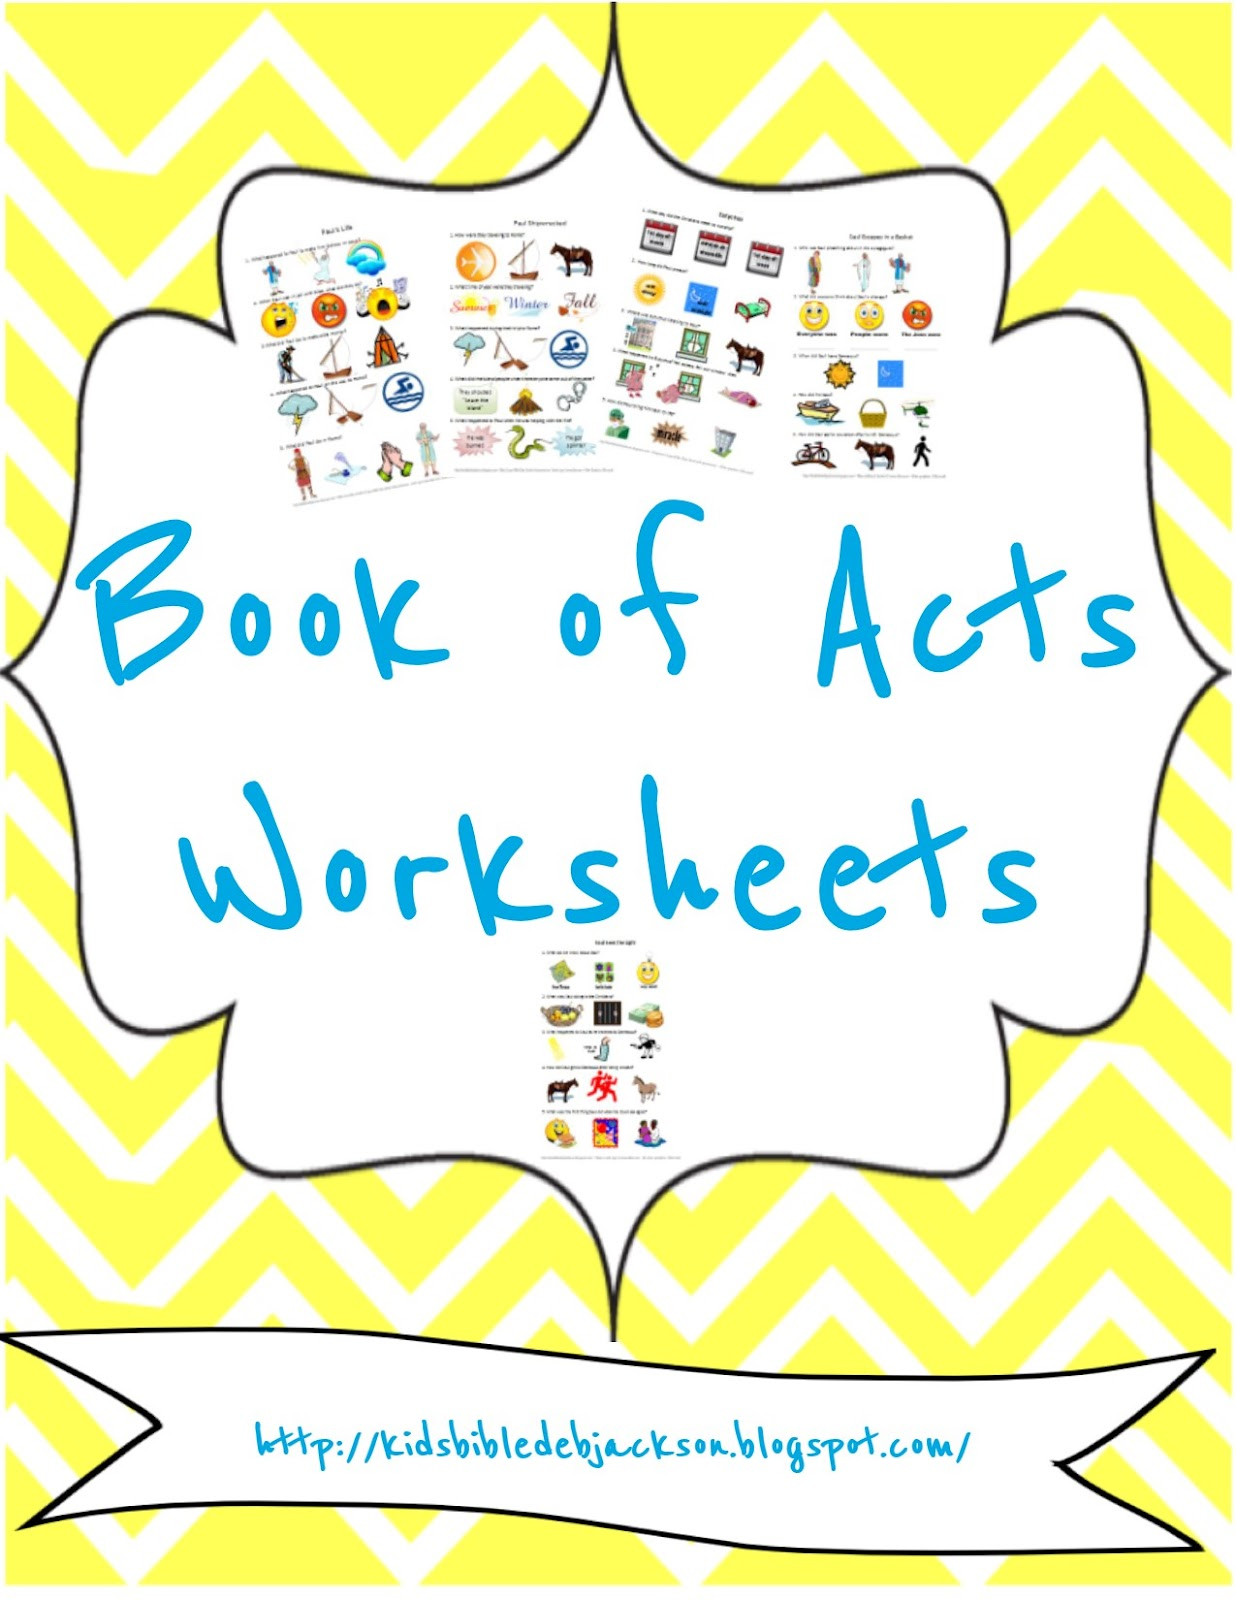 http://kidsbibledebjackson.blogspot.com/2012/11/this-is-basically-what-worksheets-for.html